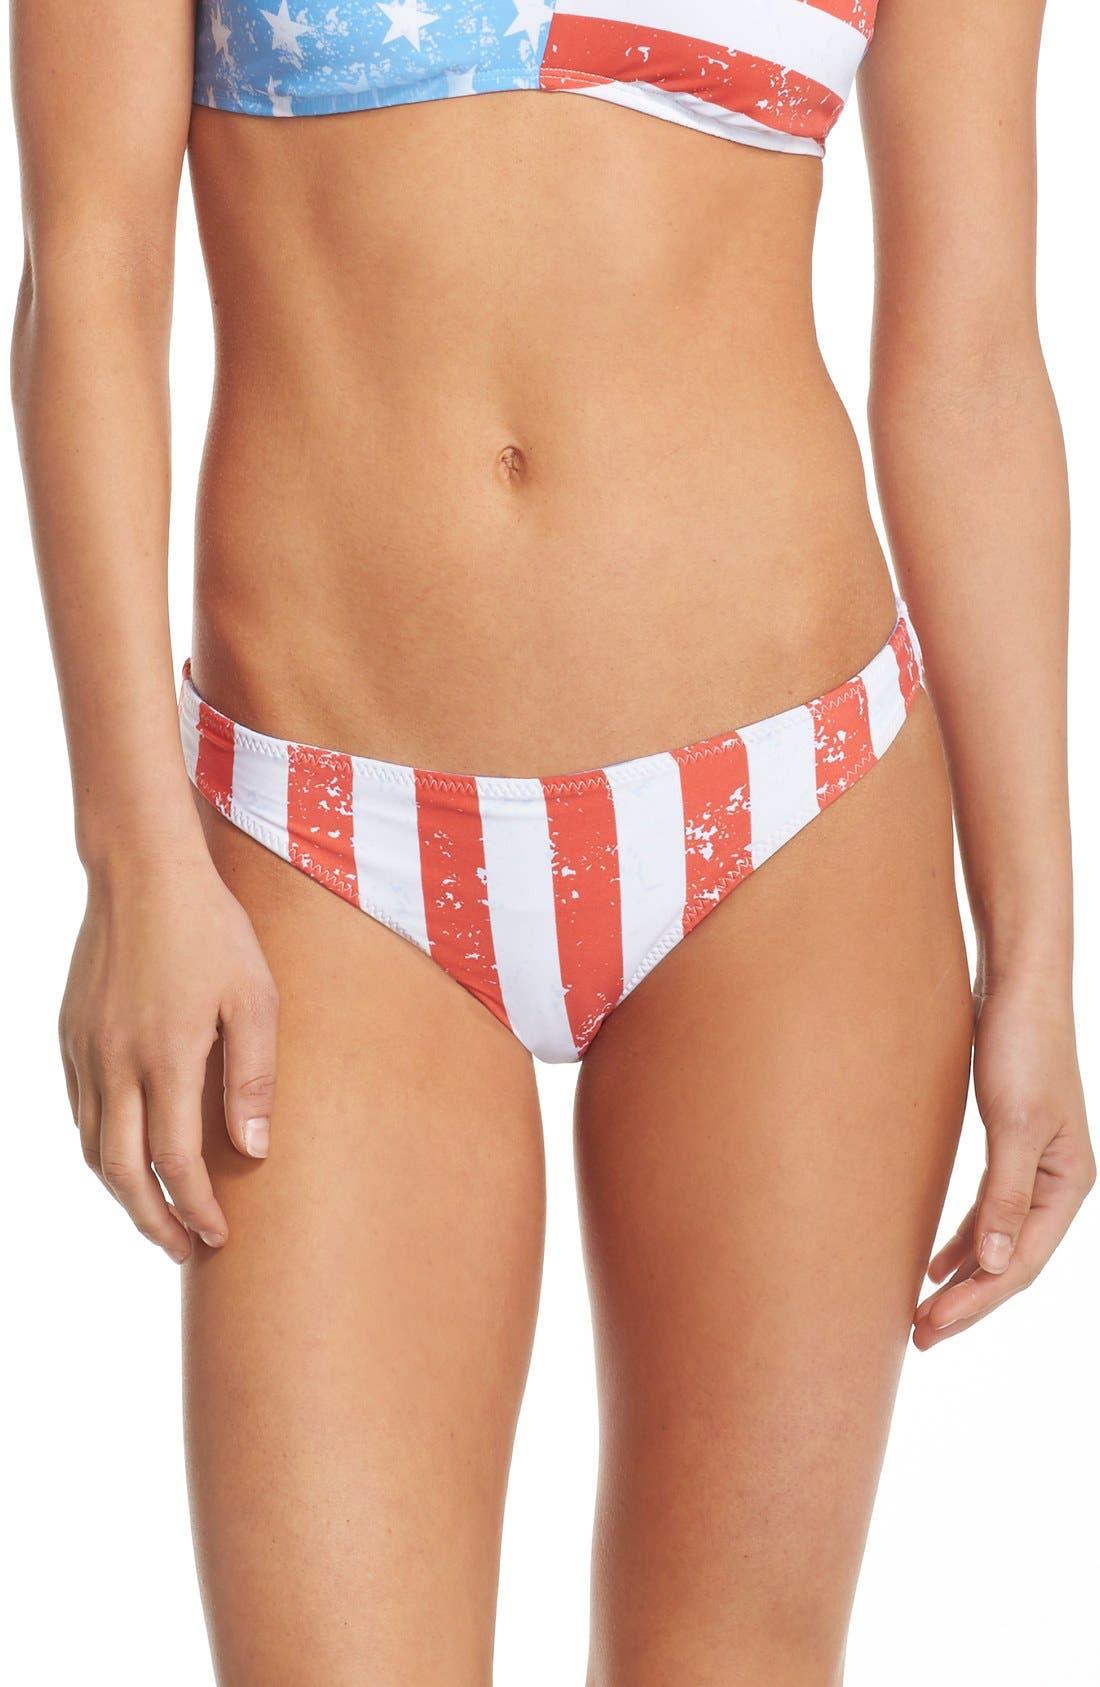 Alternate Image 1 Selected - The Bikini Lab 'American Flag - Red, White & You' Reversible Bikini Bottoms